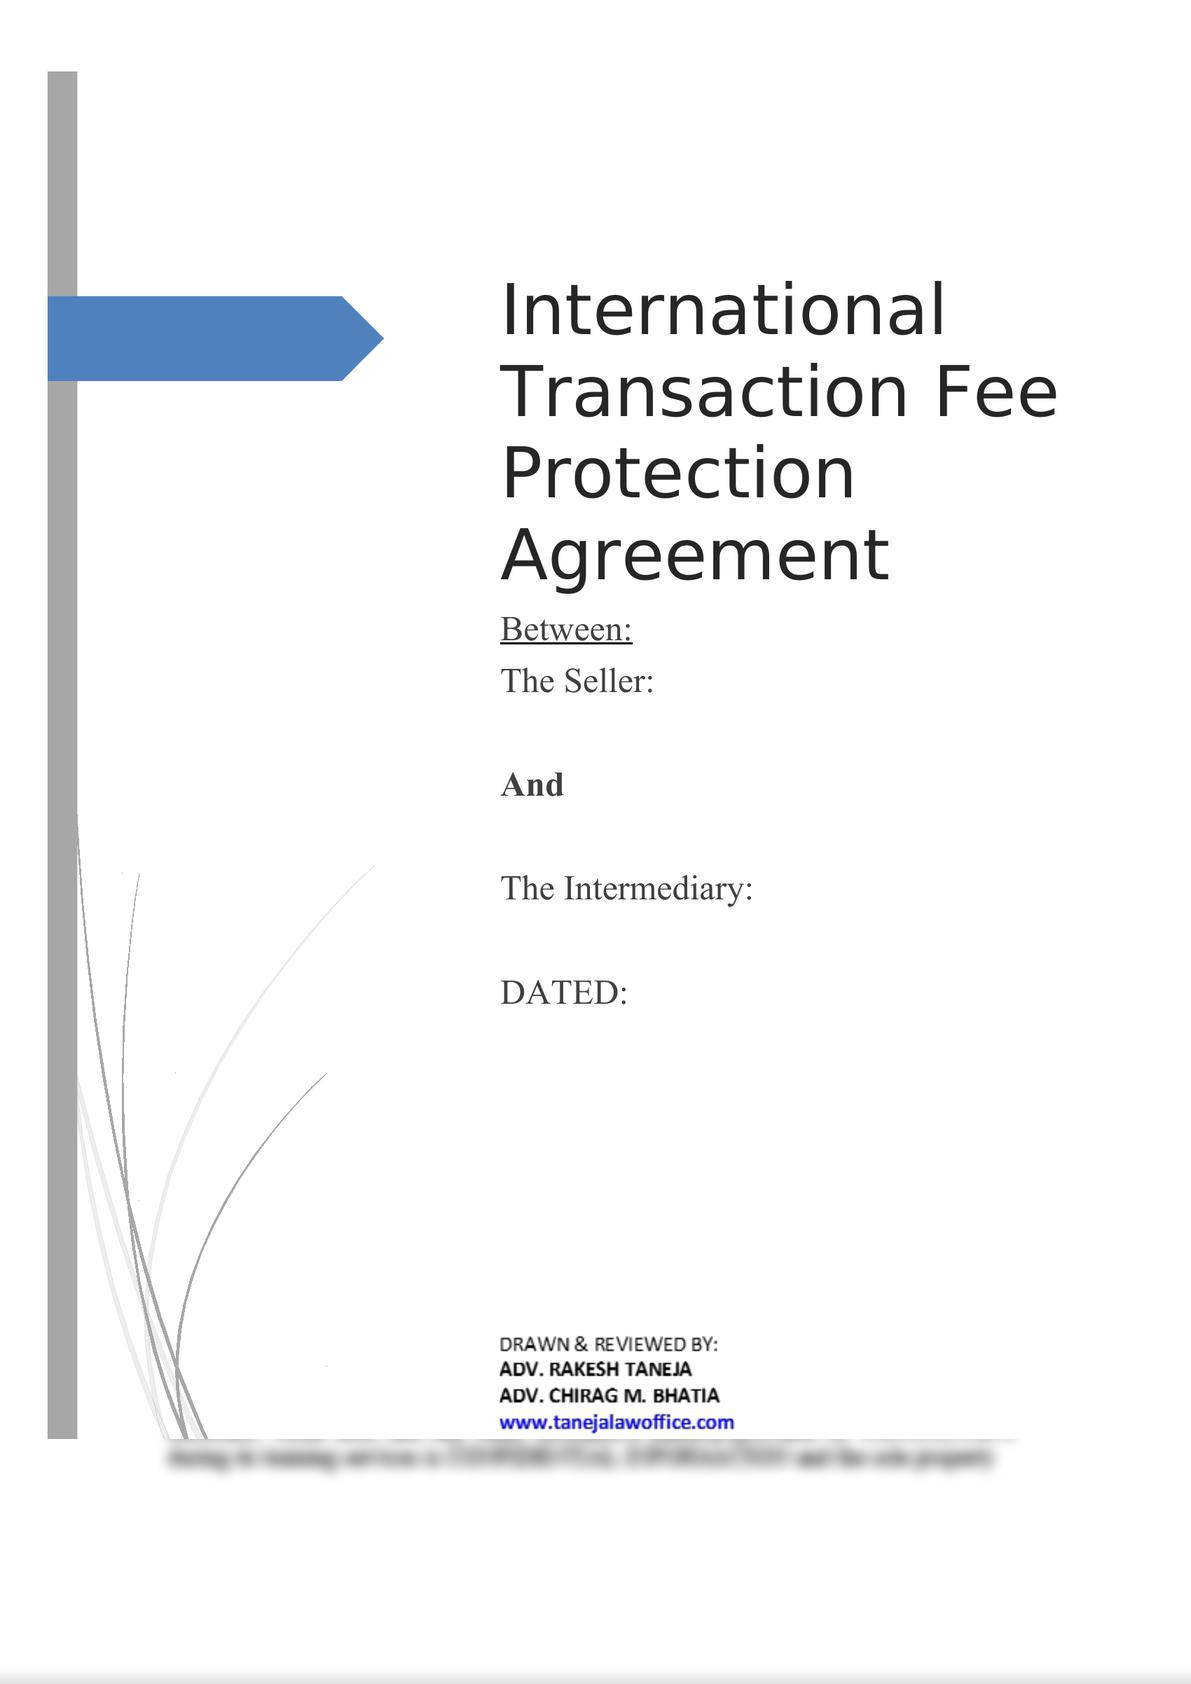 International Transaction Fee Protection Agreement-0